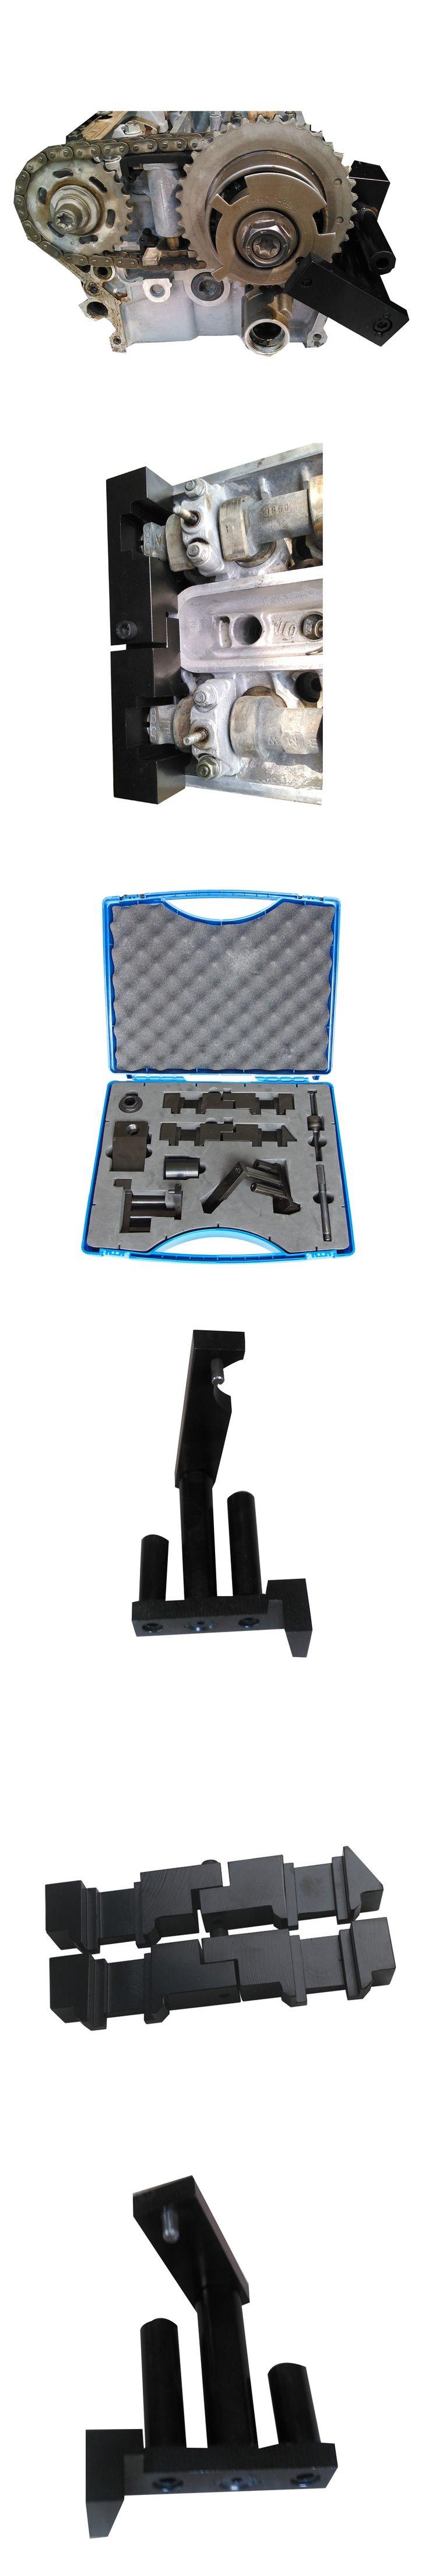 11 PCS Camshaft Alignment Tool For BMW M62 V8 4.4 Vanos Engine Timing Tool Kit